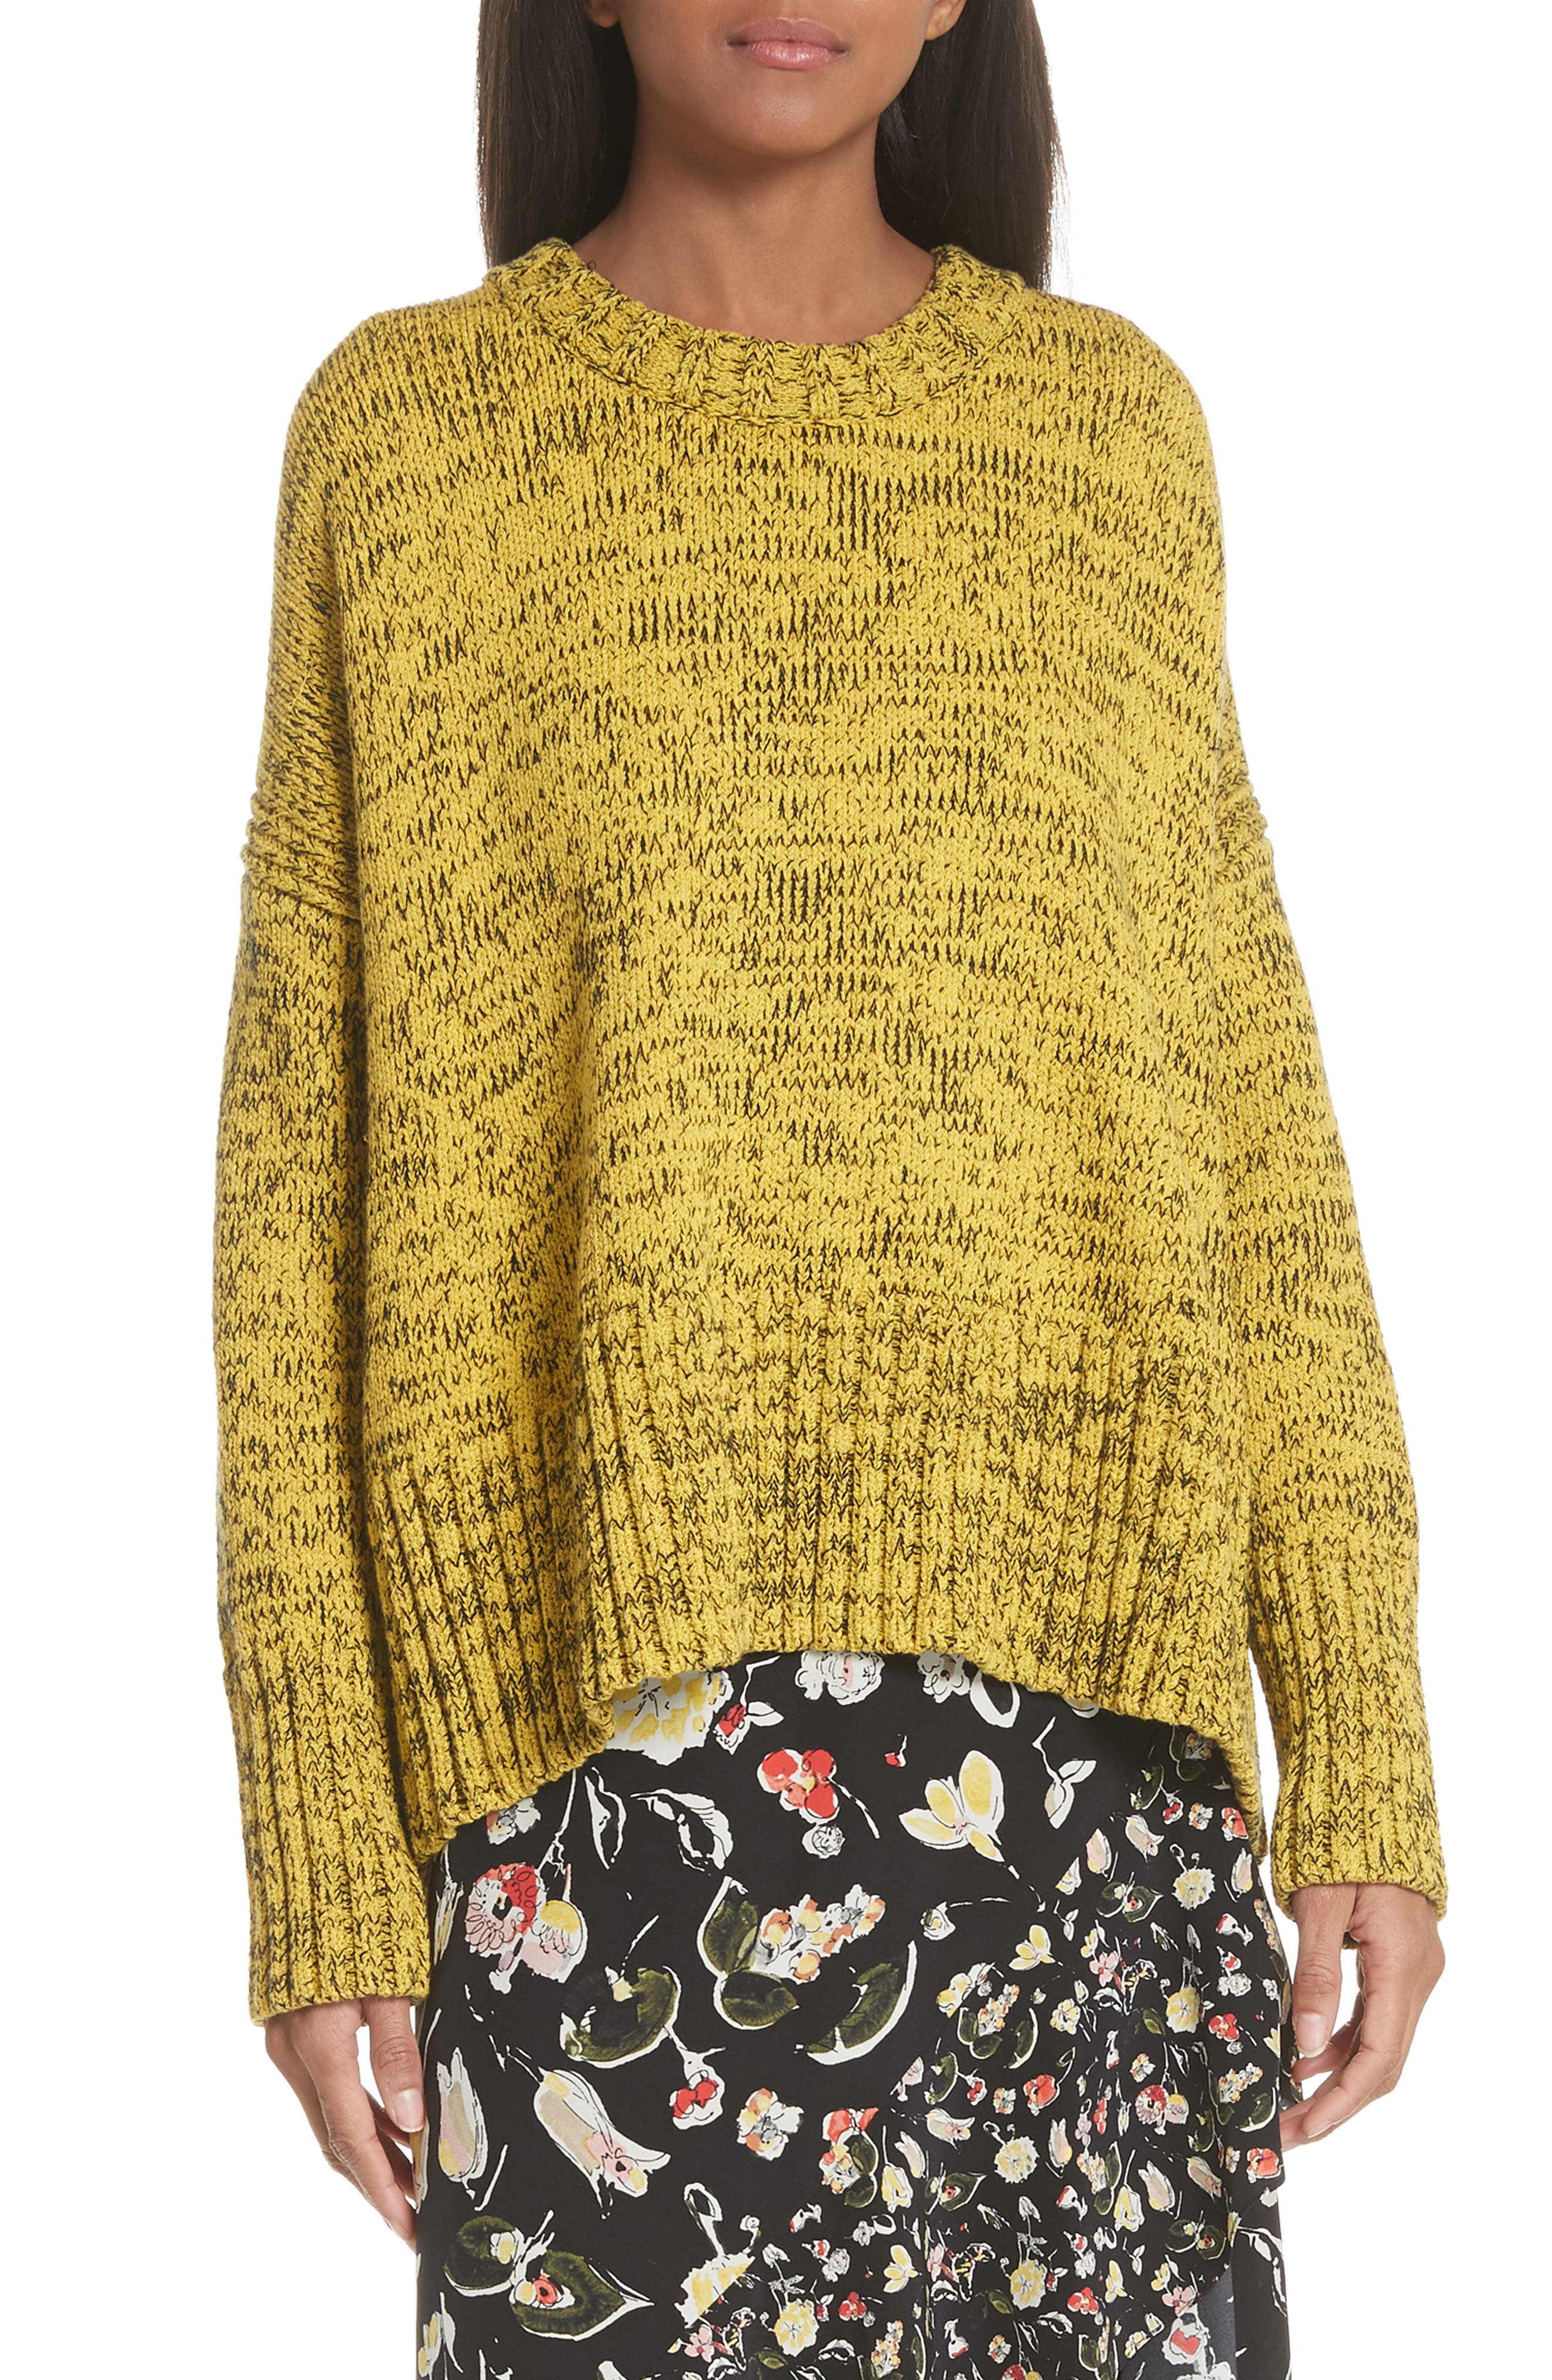 GREY JASON WU Back Tie Cotton Blend Sweater in Sunbeam/ Black